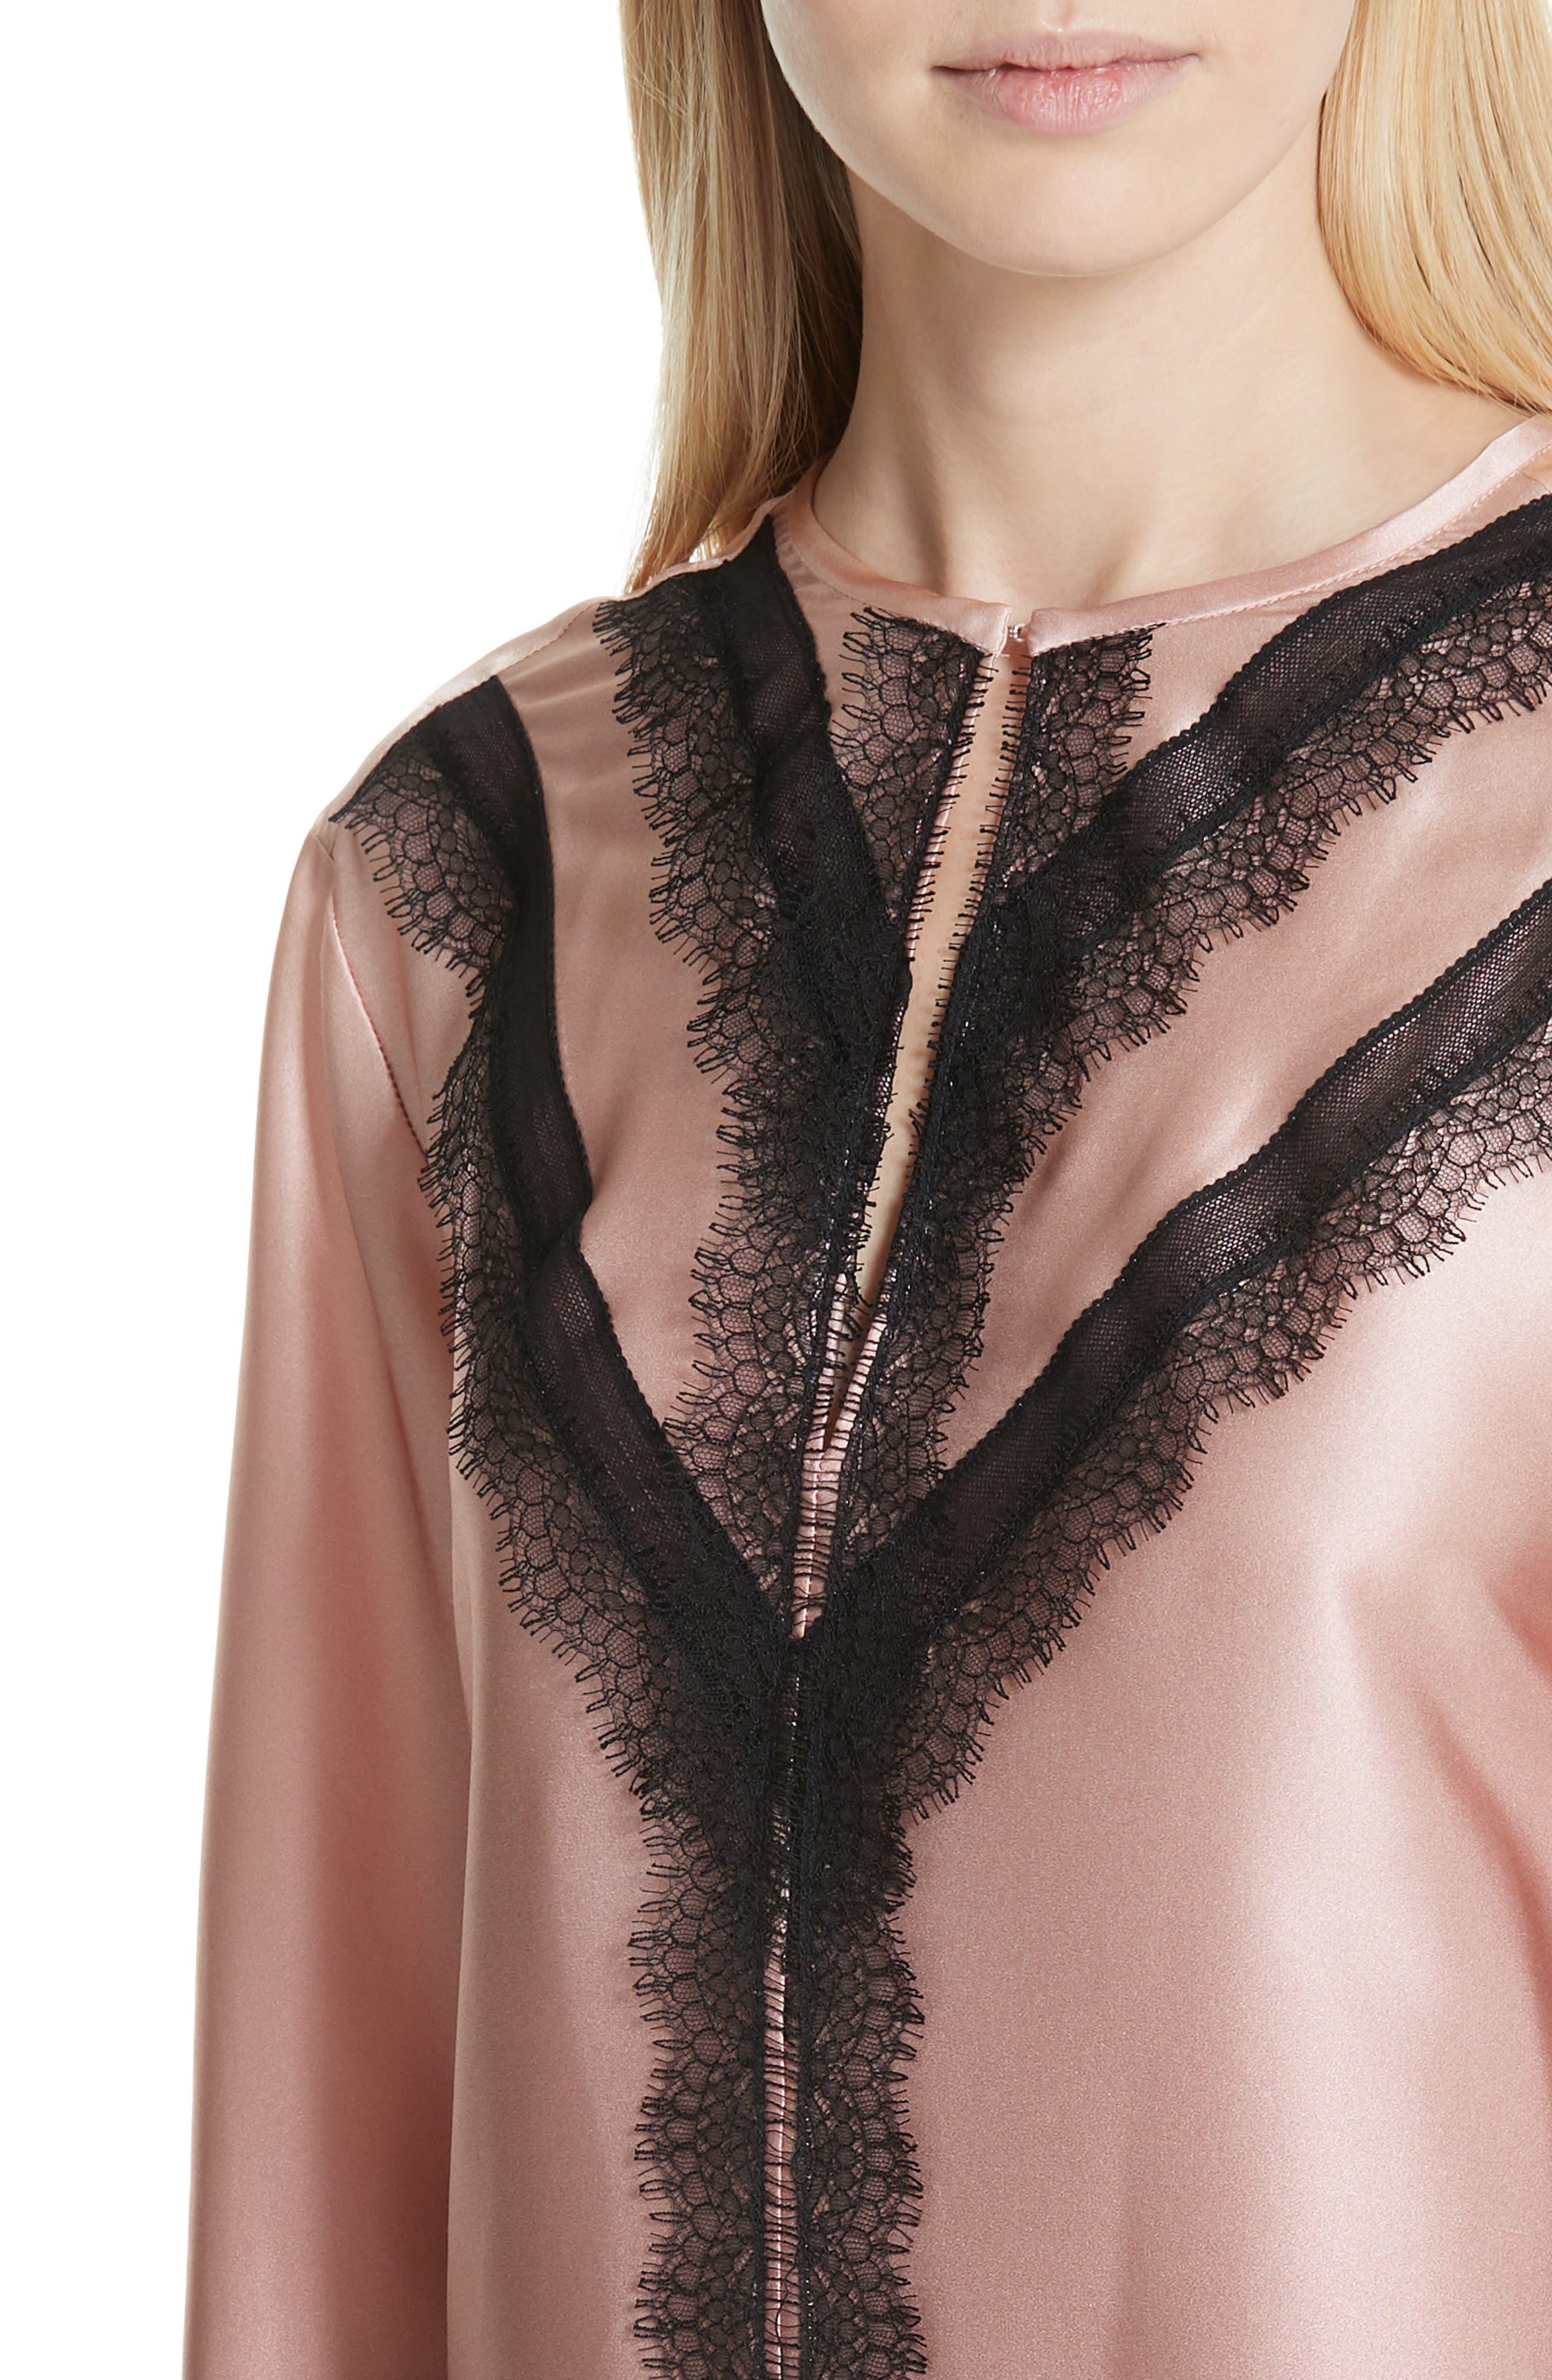 GREY Jason Wu Ombré Silk Shirt,                             Alternate thumbnail 4, color,                             DESERT ROSE